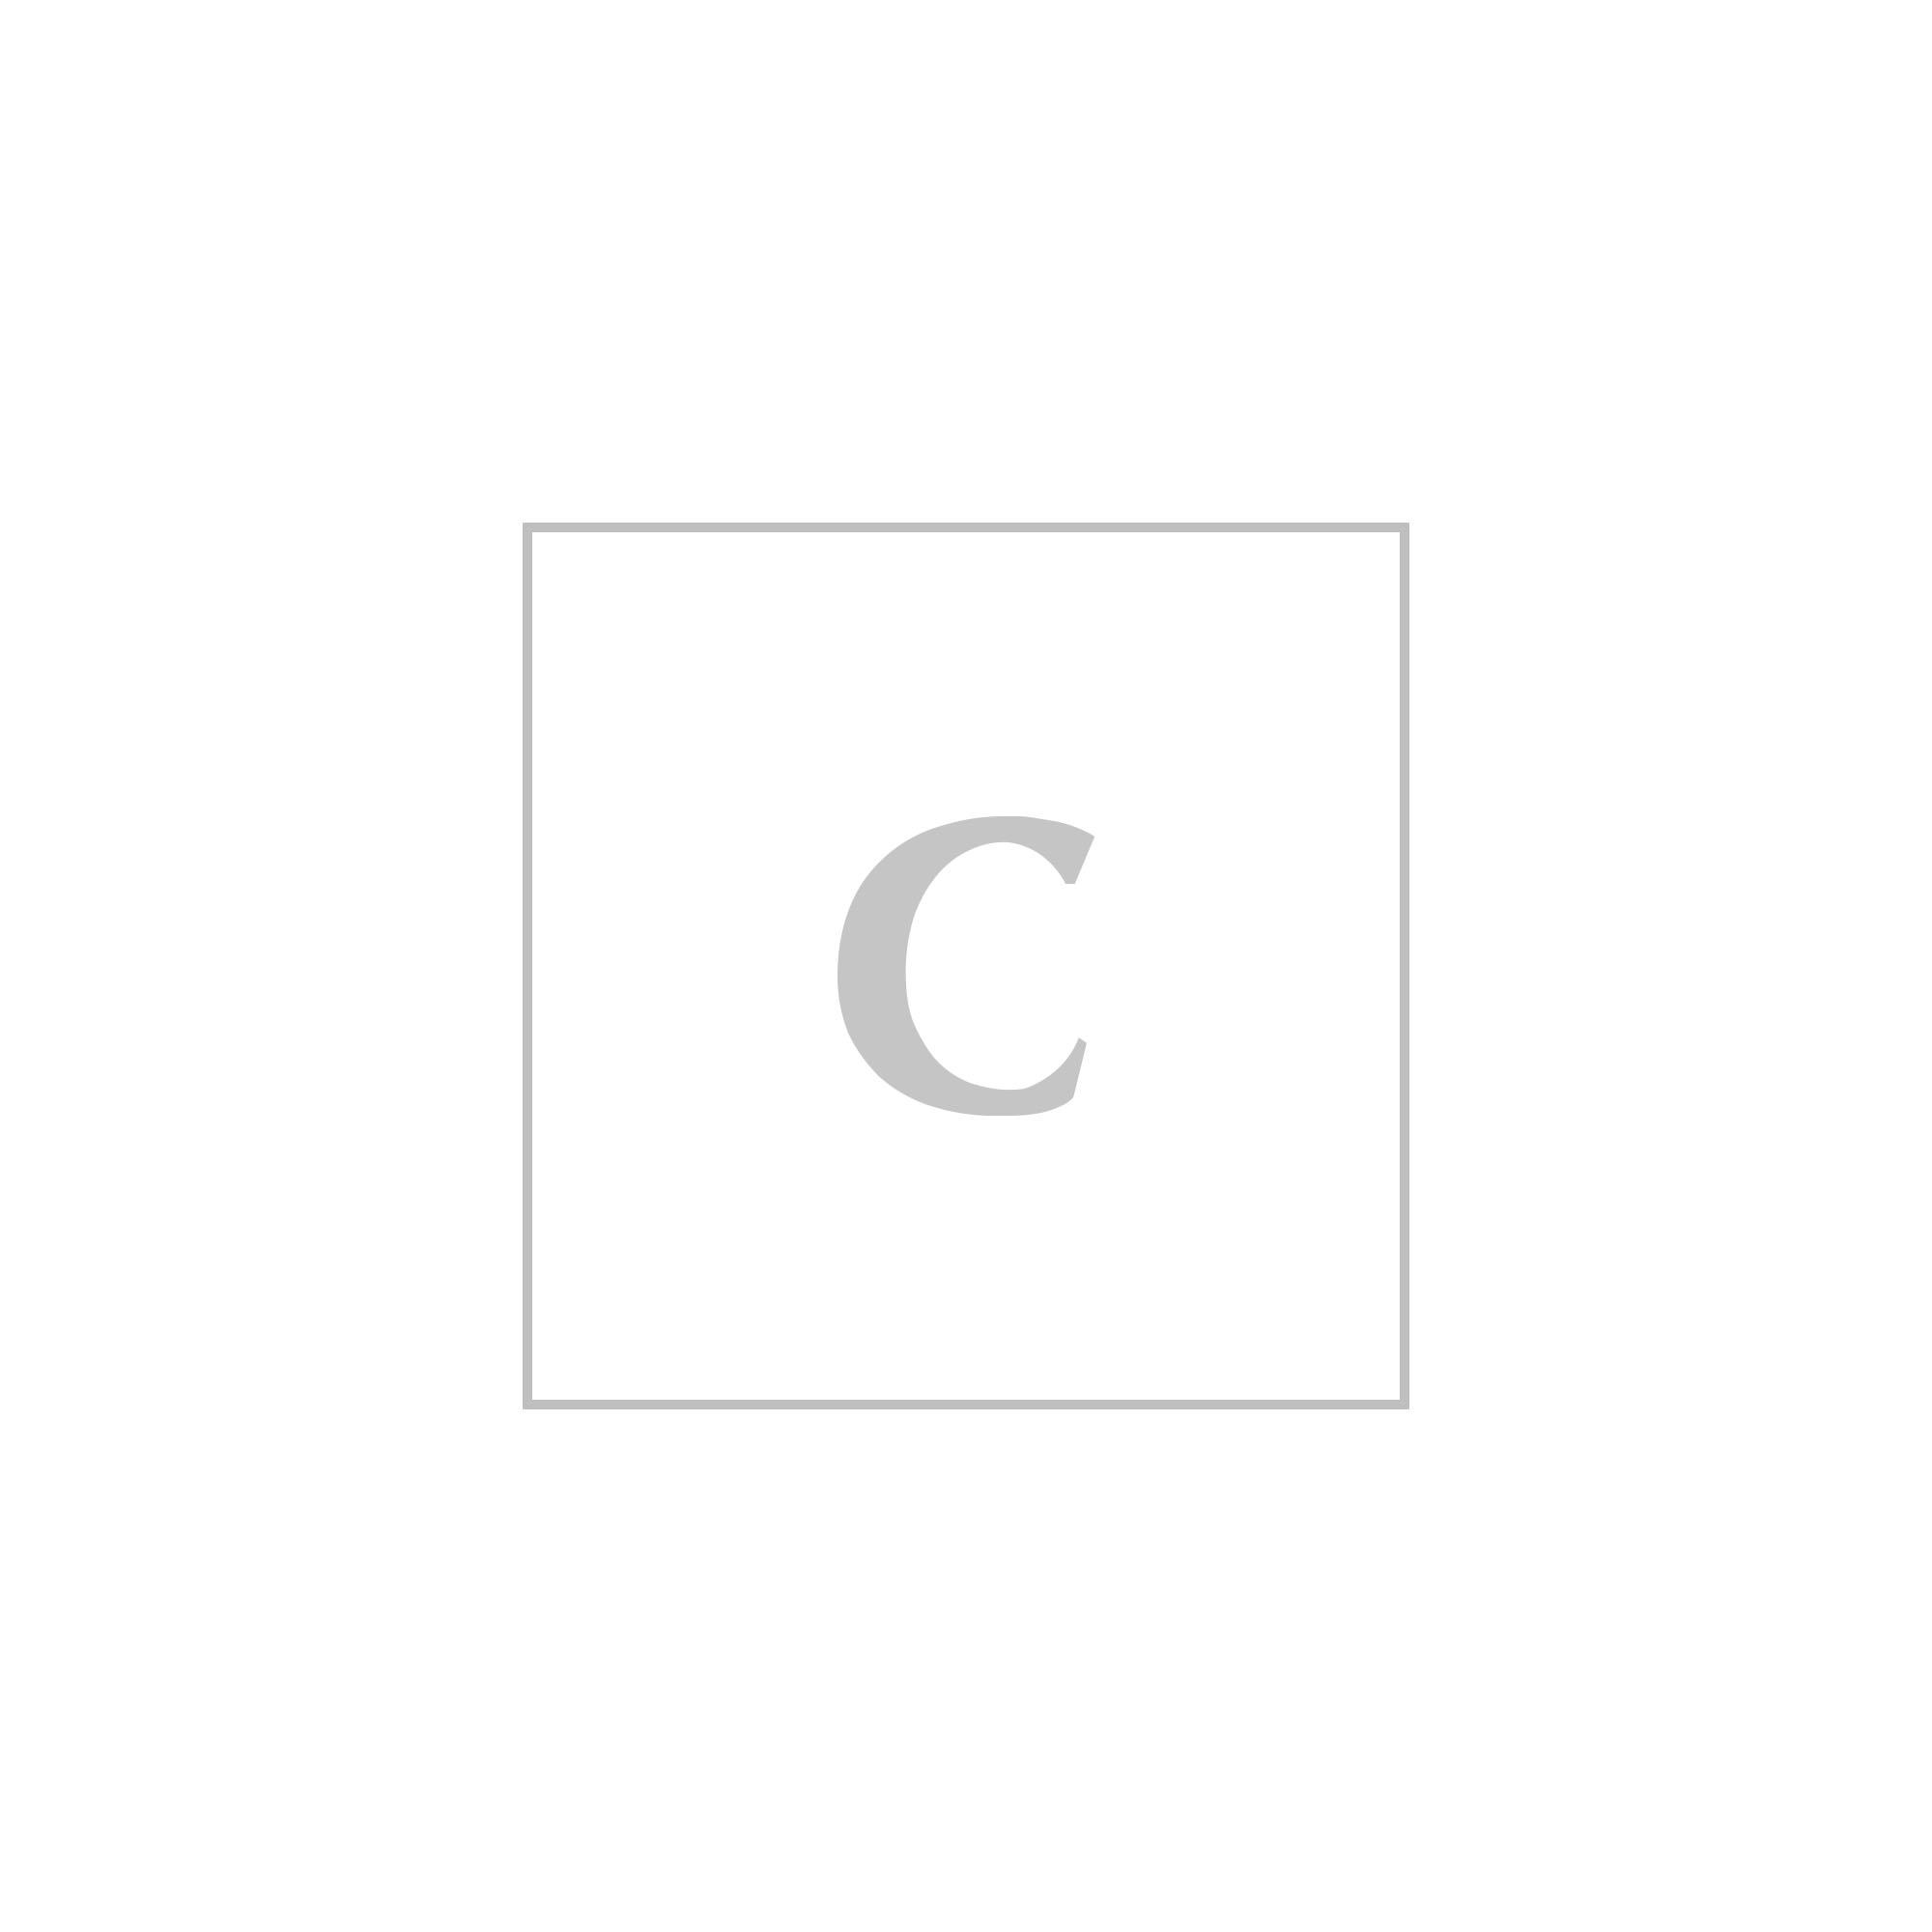 Calvin klein established 1978 logo key charm